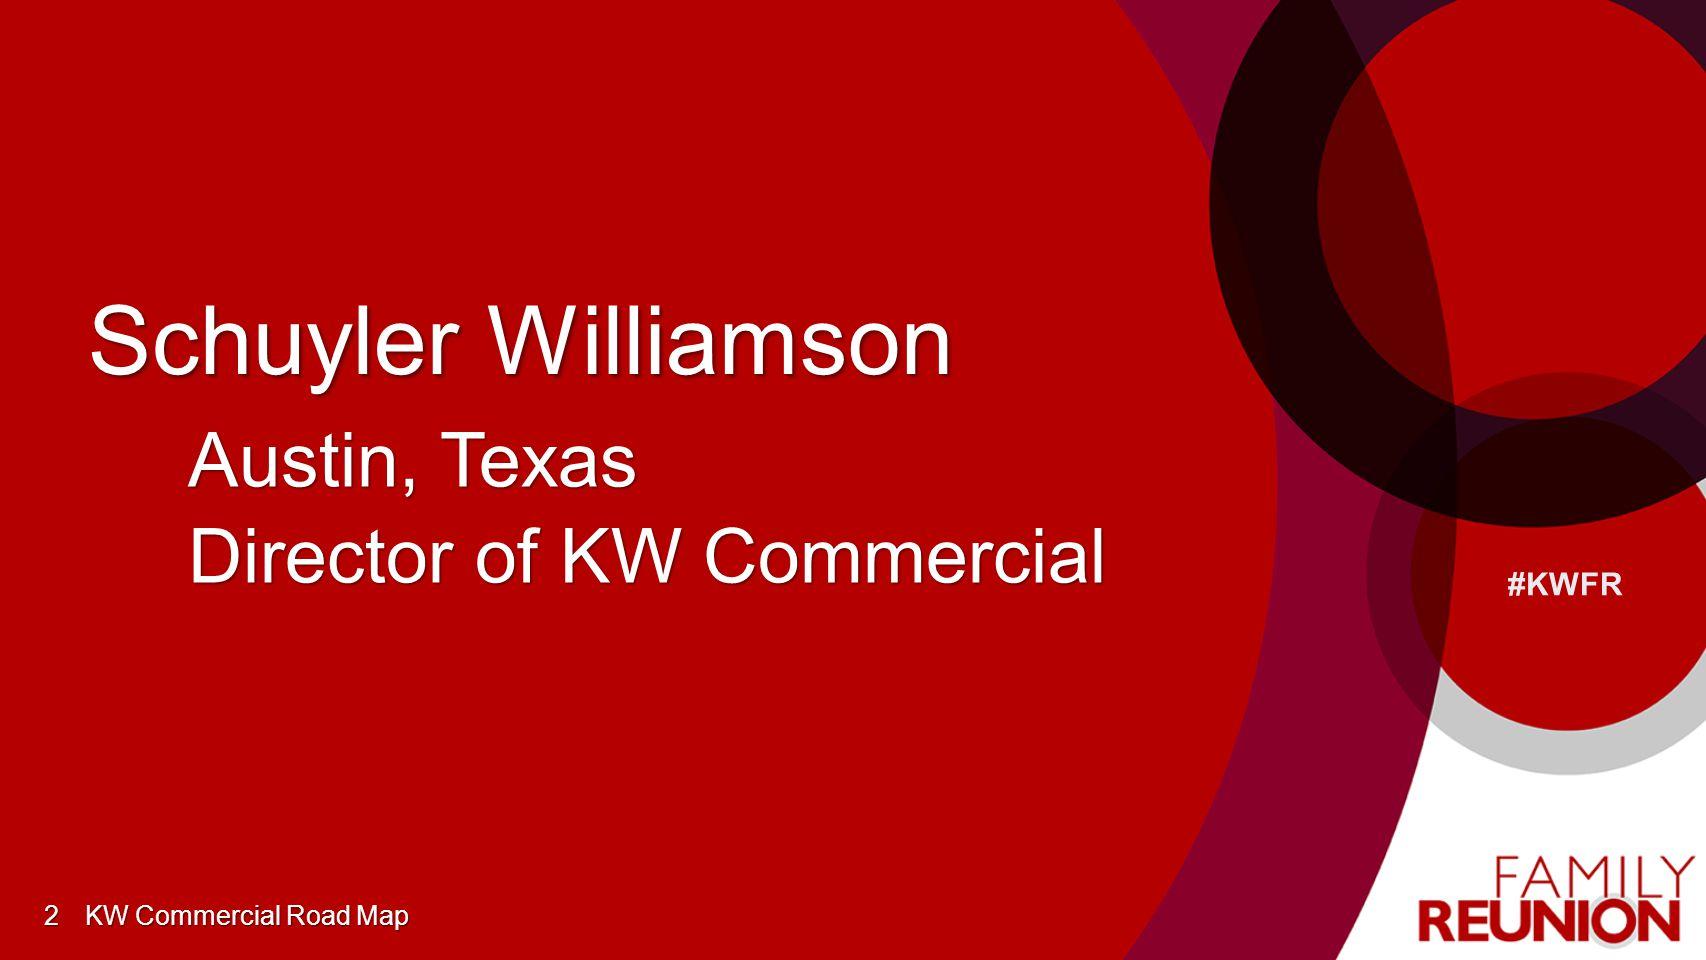 #KWFR Schuyler Williamson 2 Austin, Texas Director of KW Commercial KW Commercial Road Map